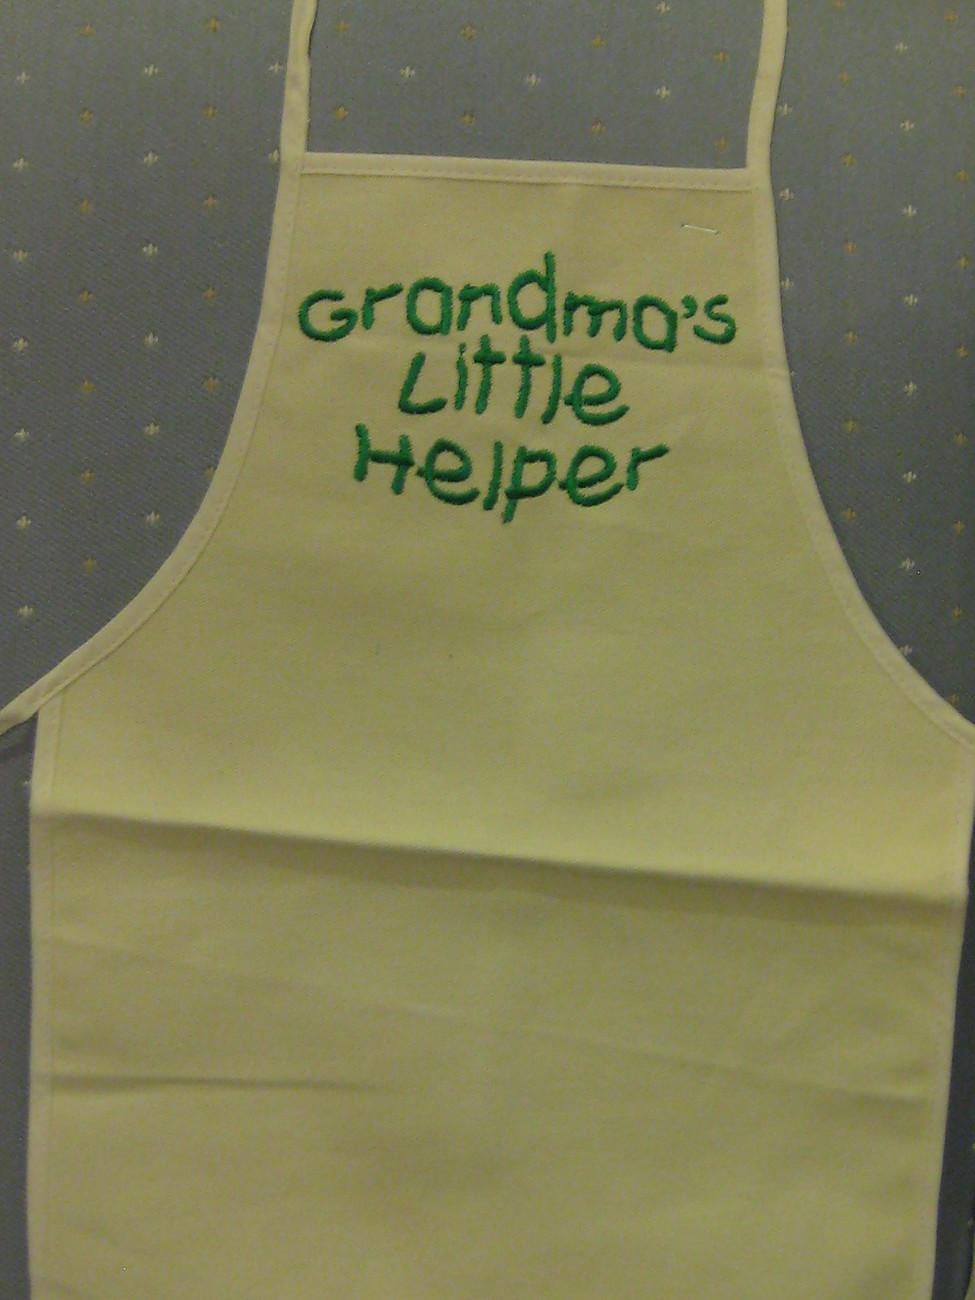 Grandma's Little Helper embroidered on child canvas apron